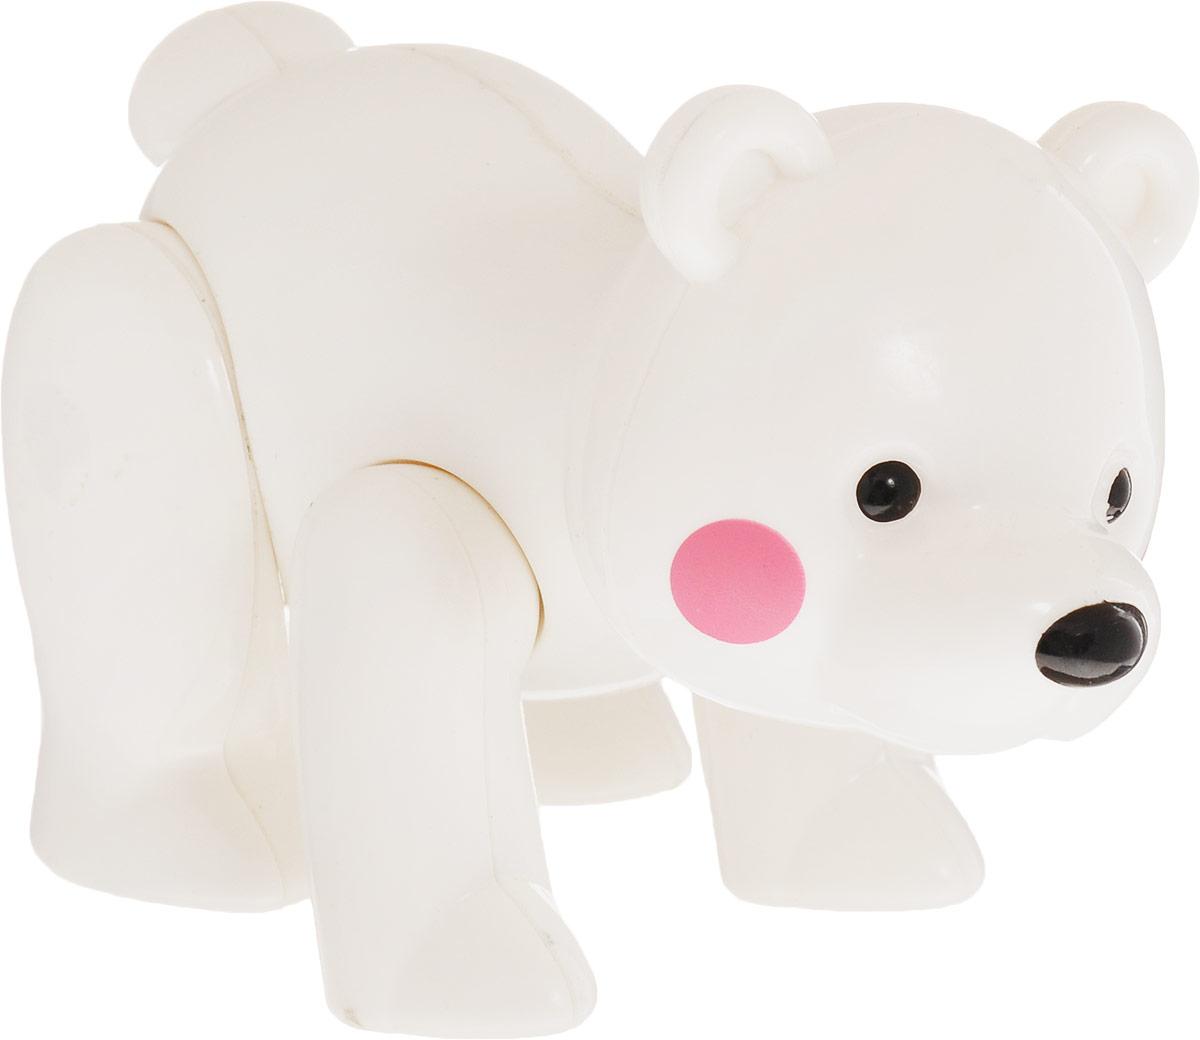 Ути-Пути Развивающая игрушка Медведь цвет белый ю каталог ути пути